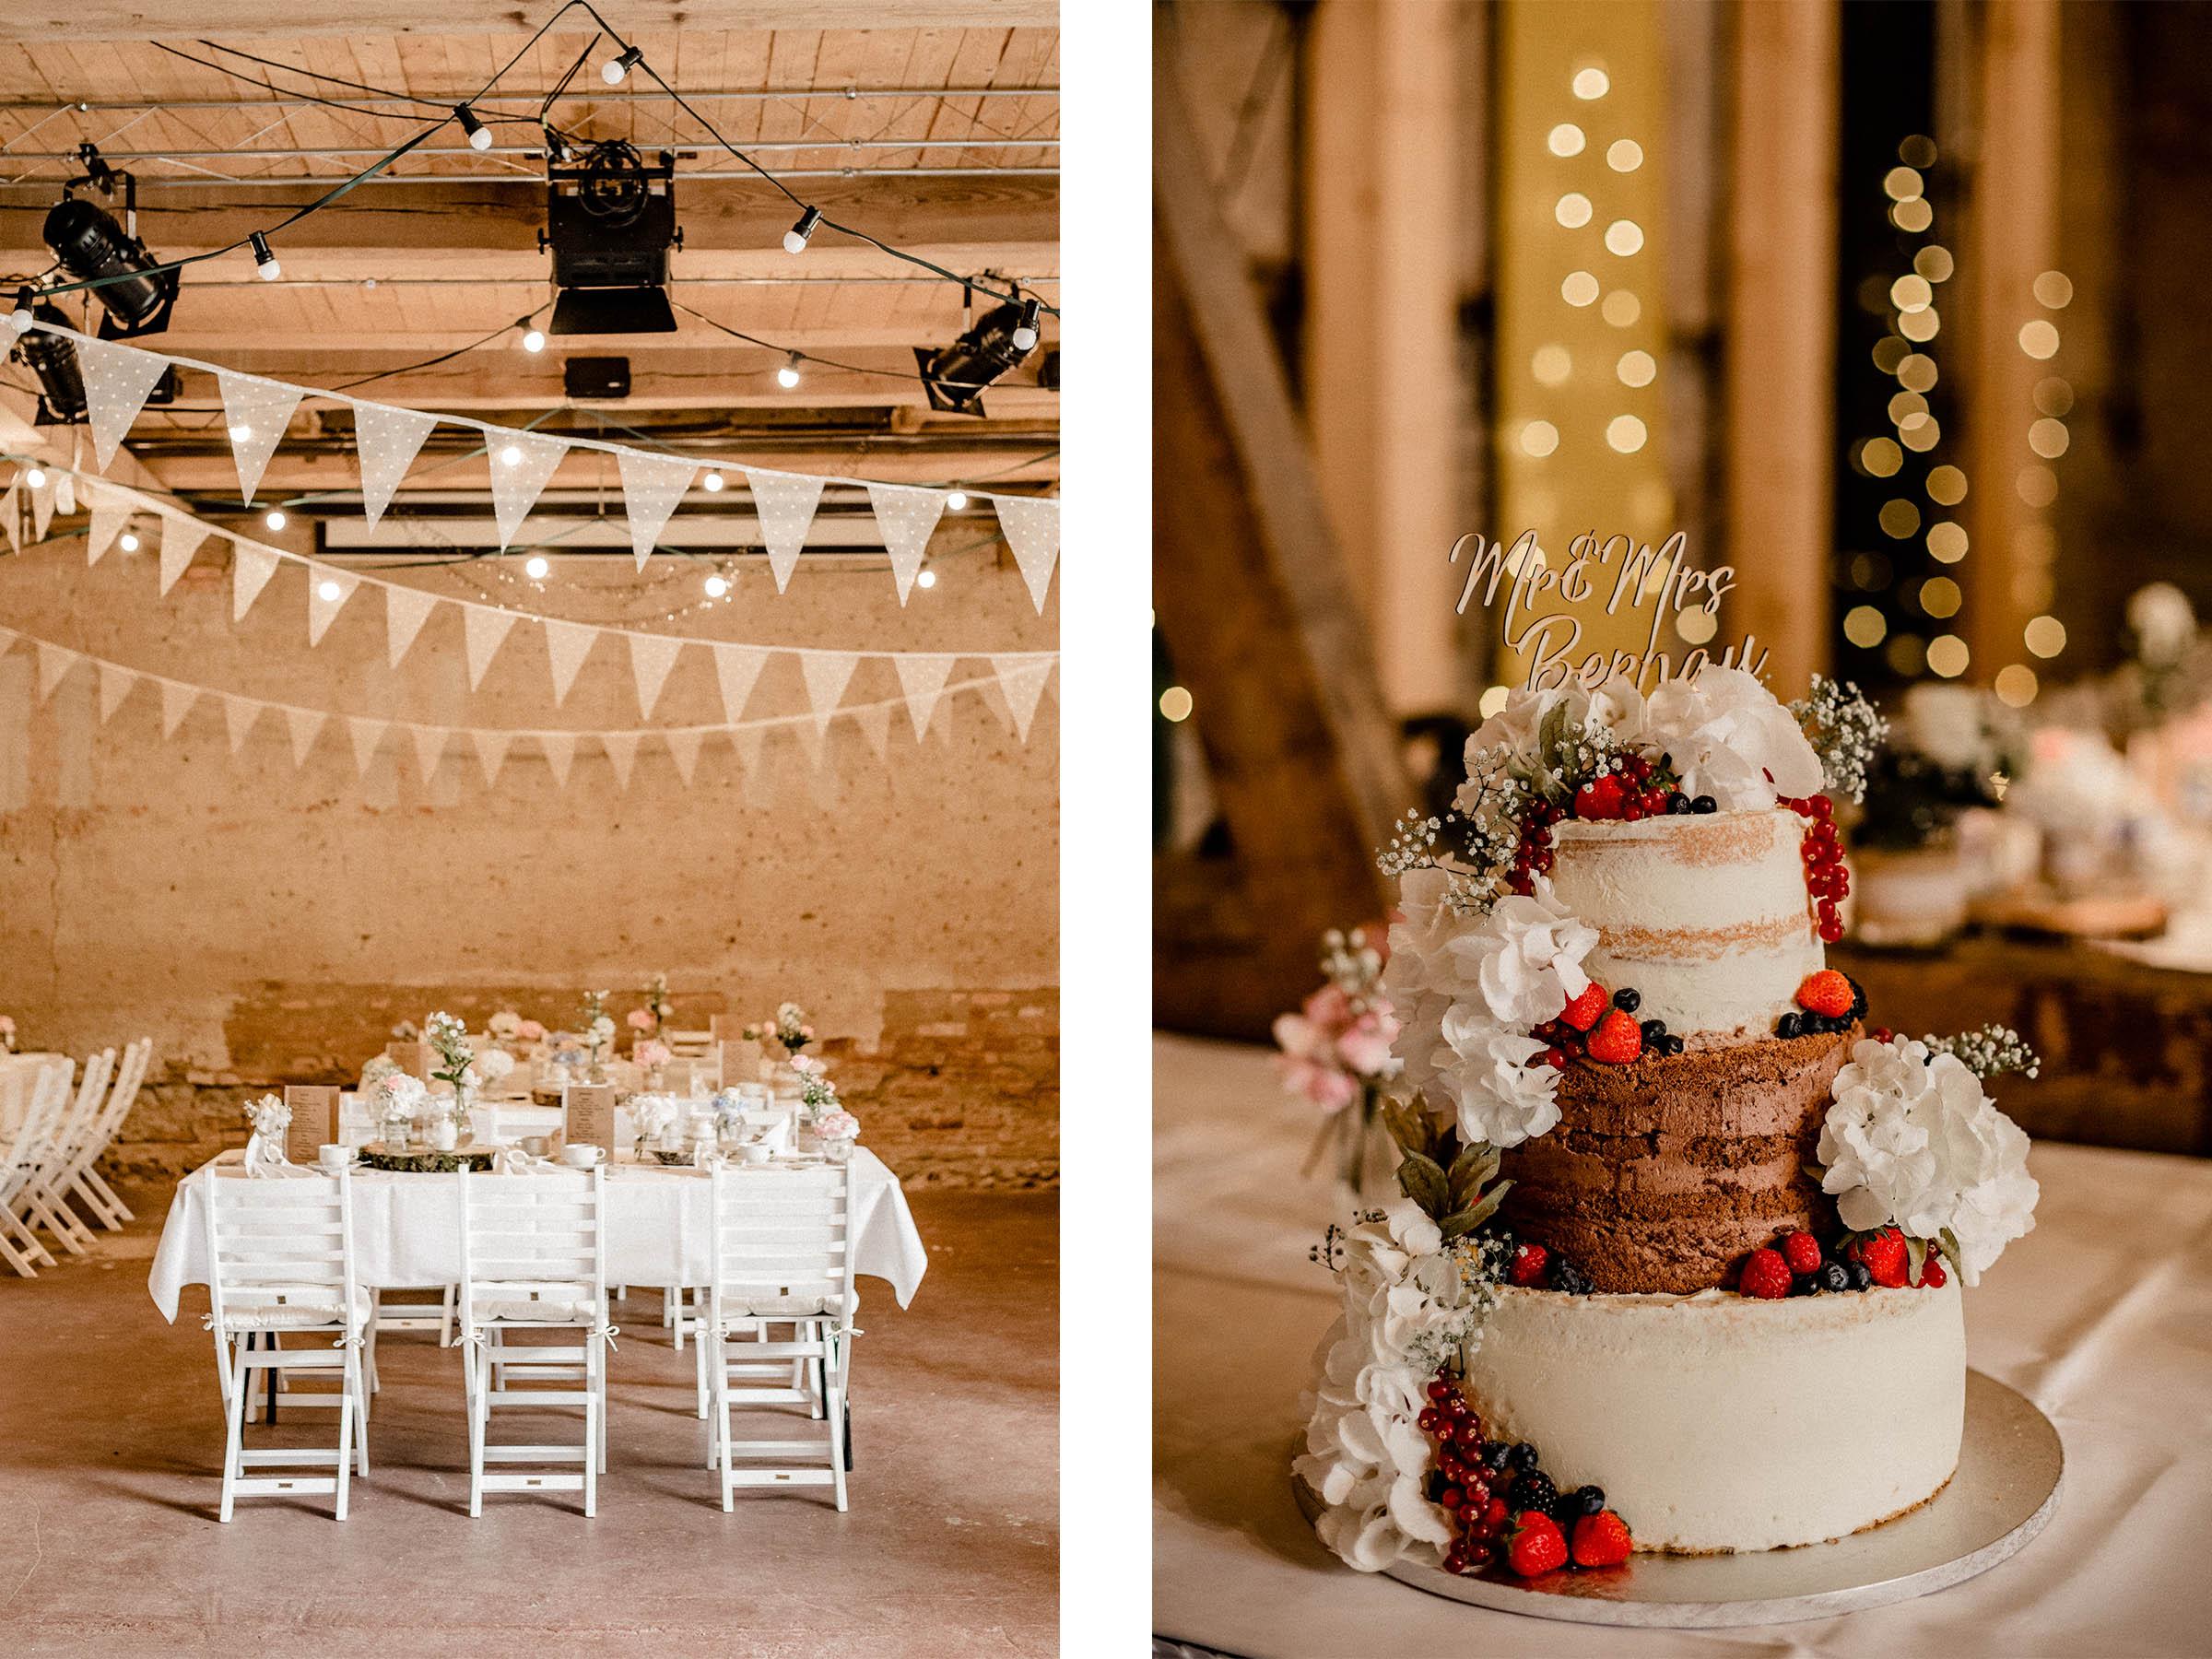 Virginia-Pech-Fotografie-Hochzeitsfotograf-Hochzeitsfotografie-Kulturscheune-Rangsdorf-Berlin-Anika-Nico